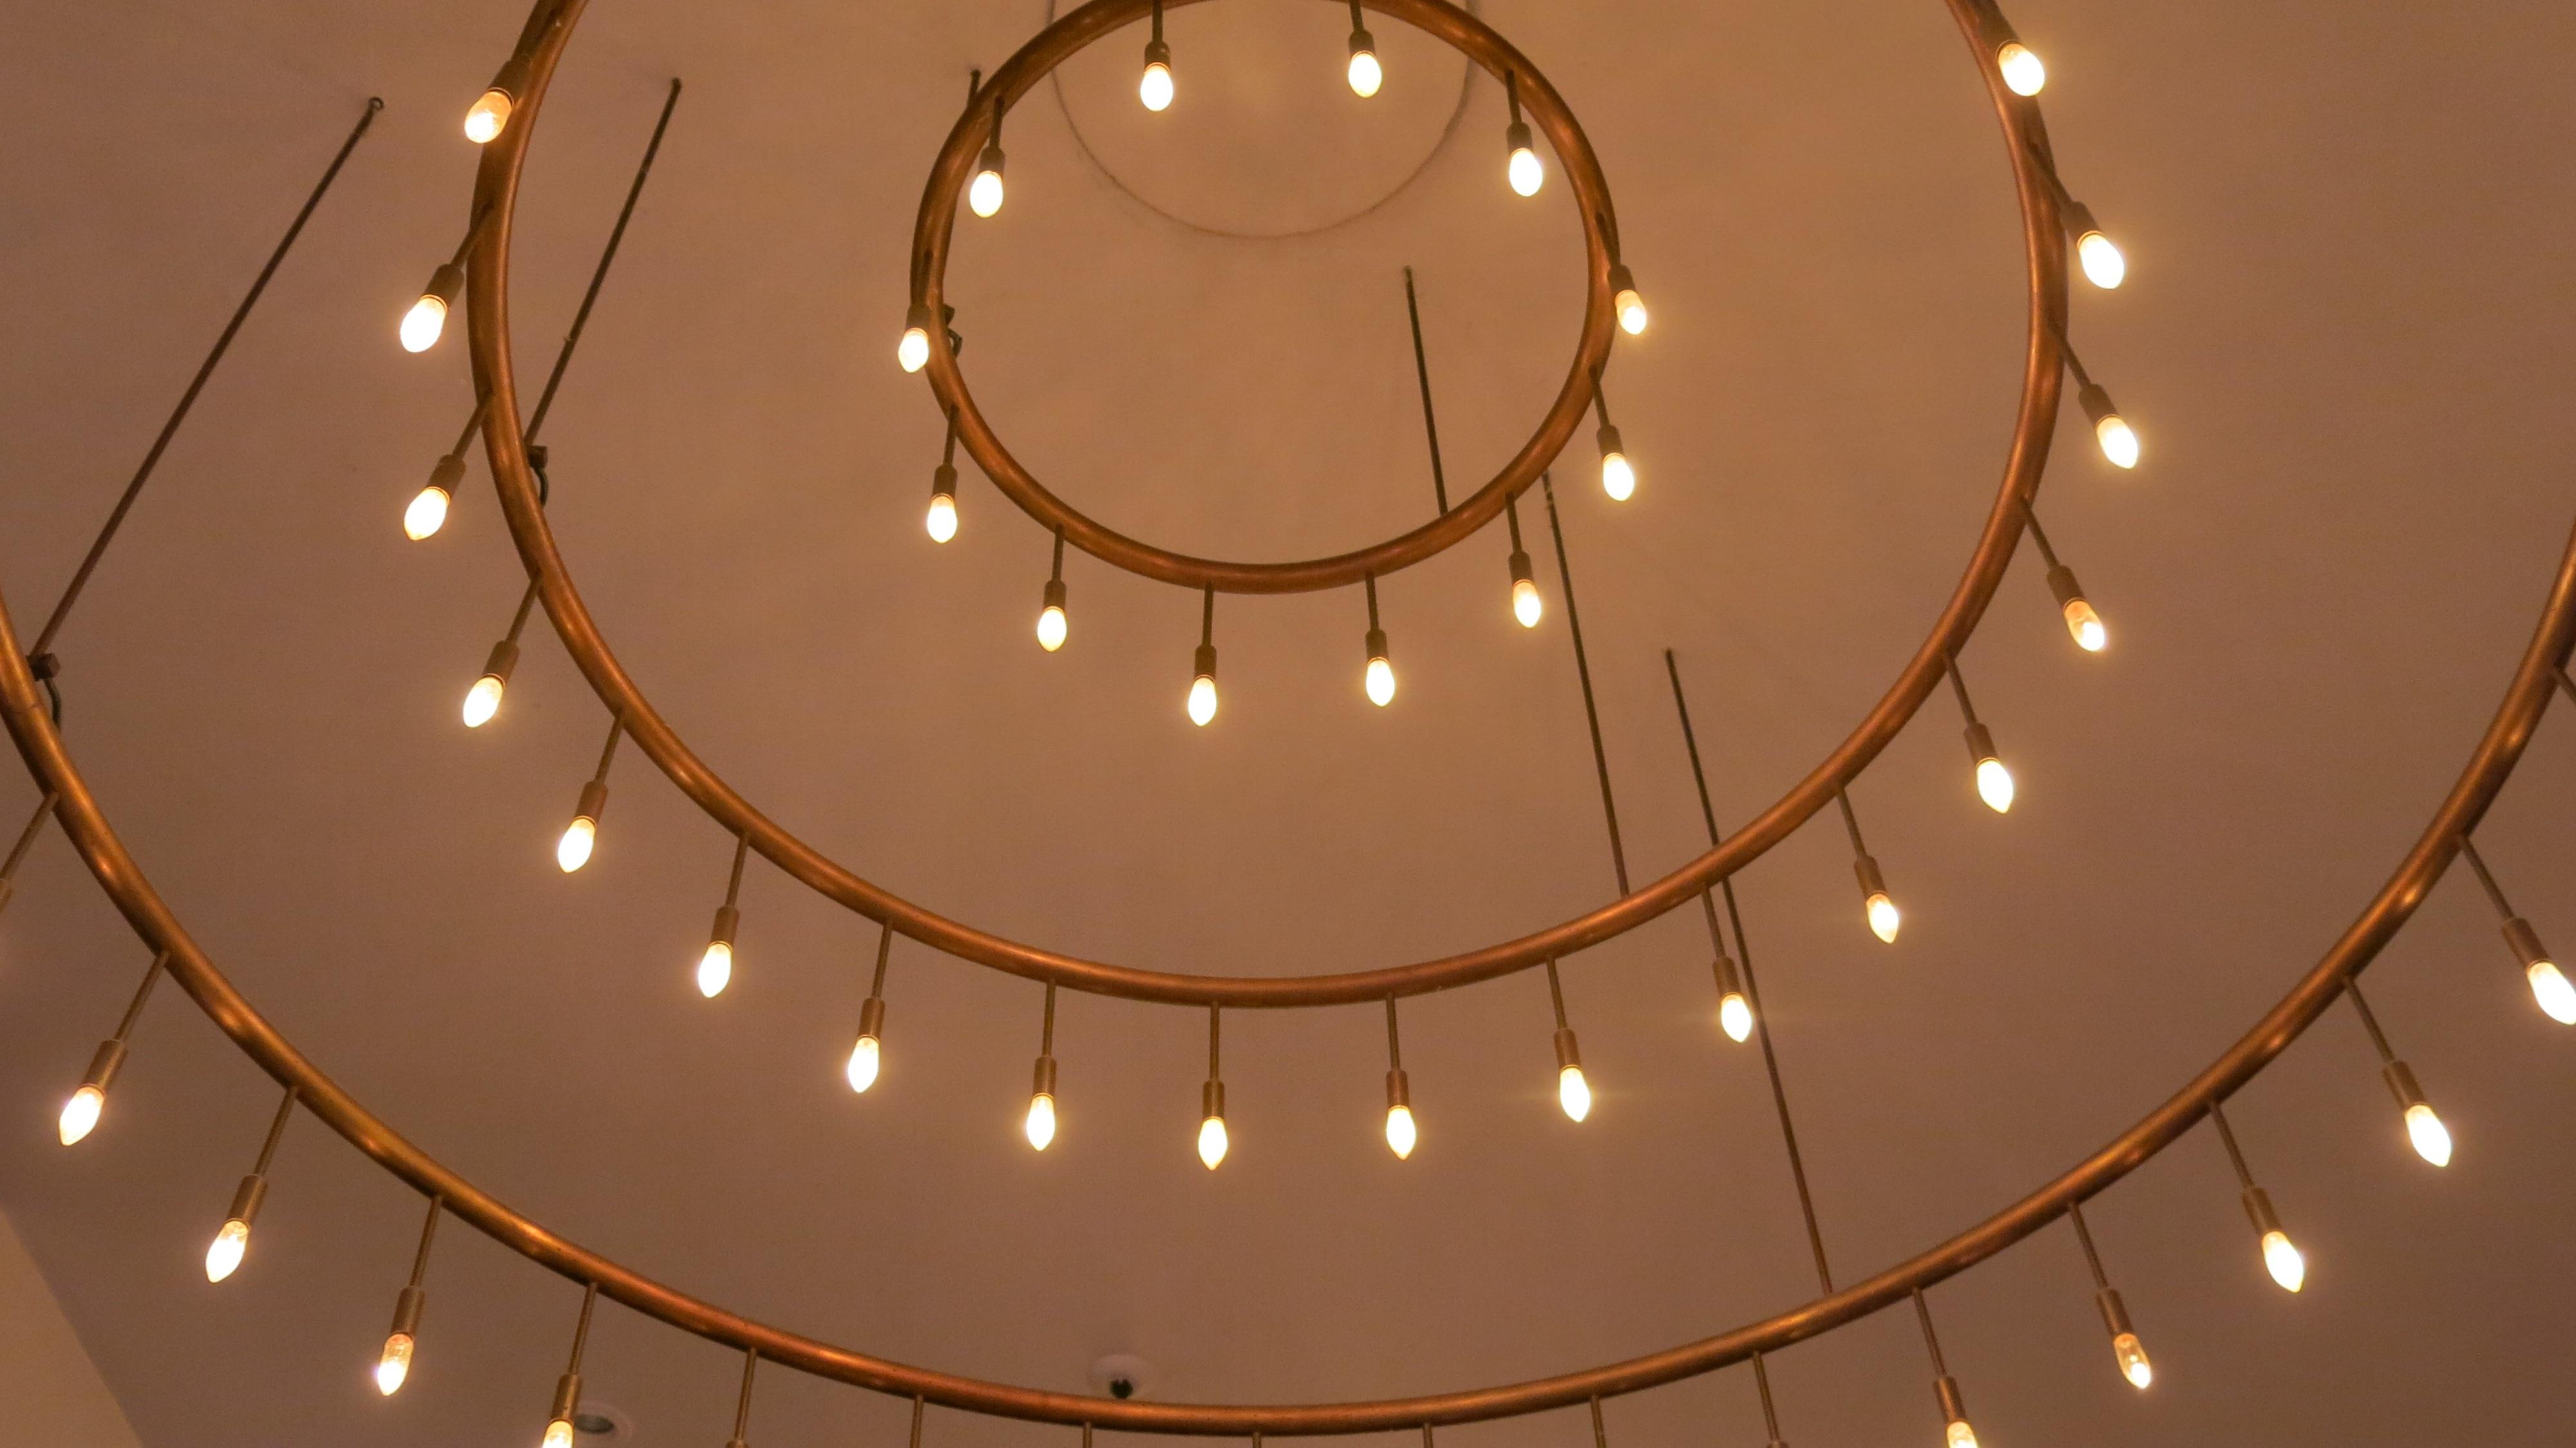 free images night spiral lighting circle candlestick symmetry